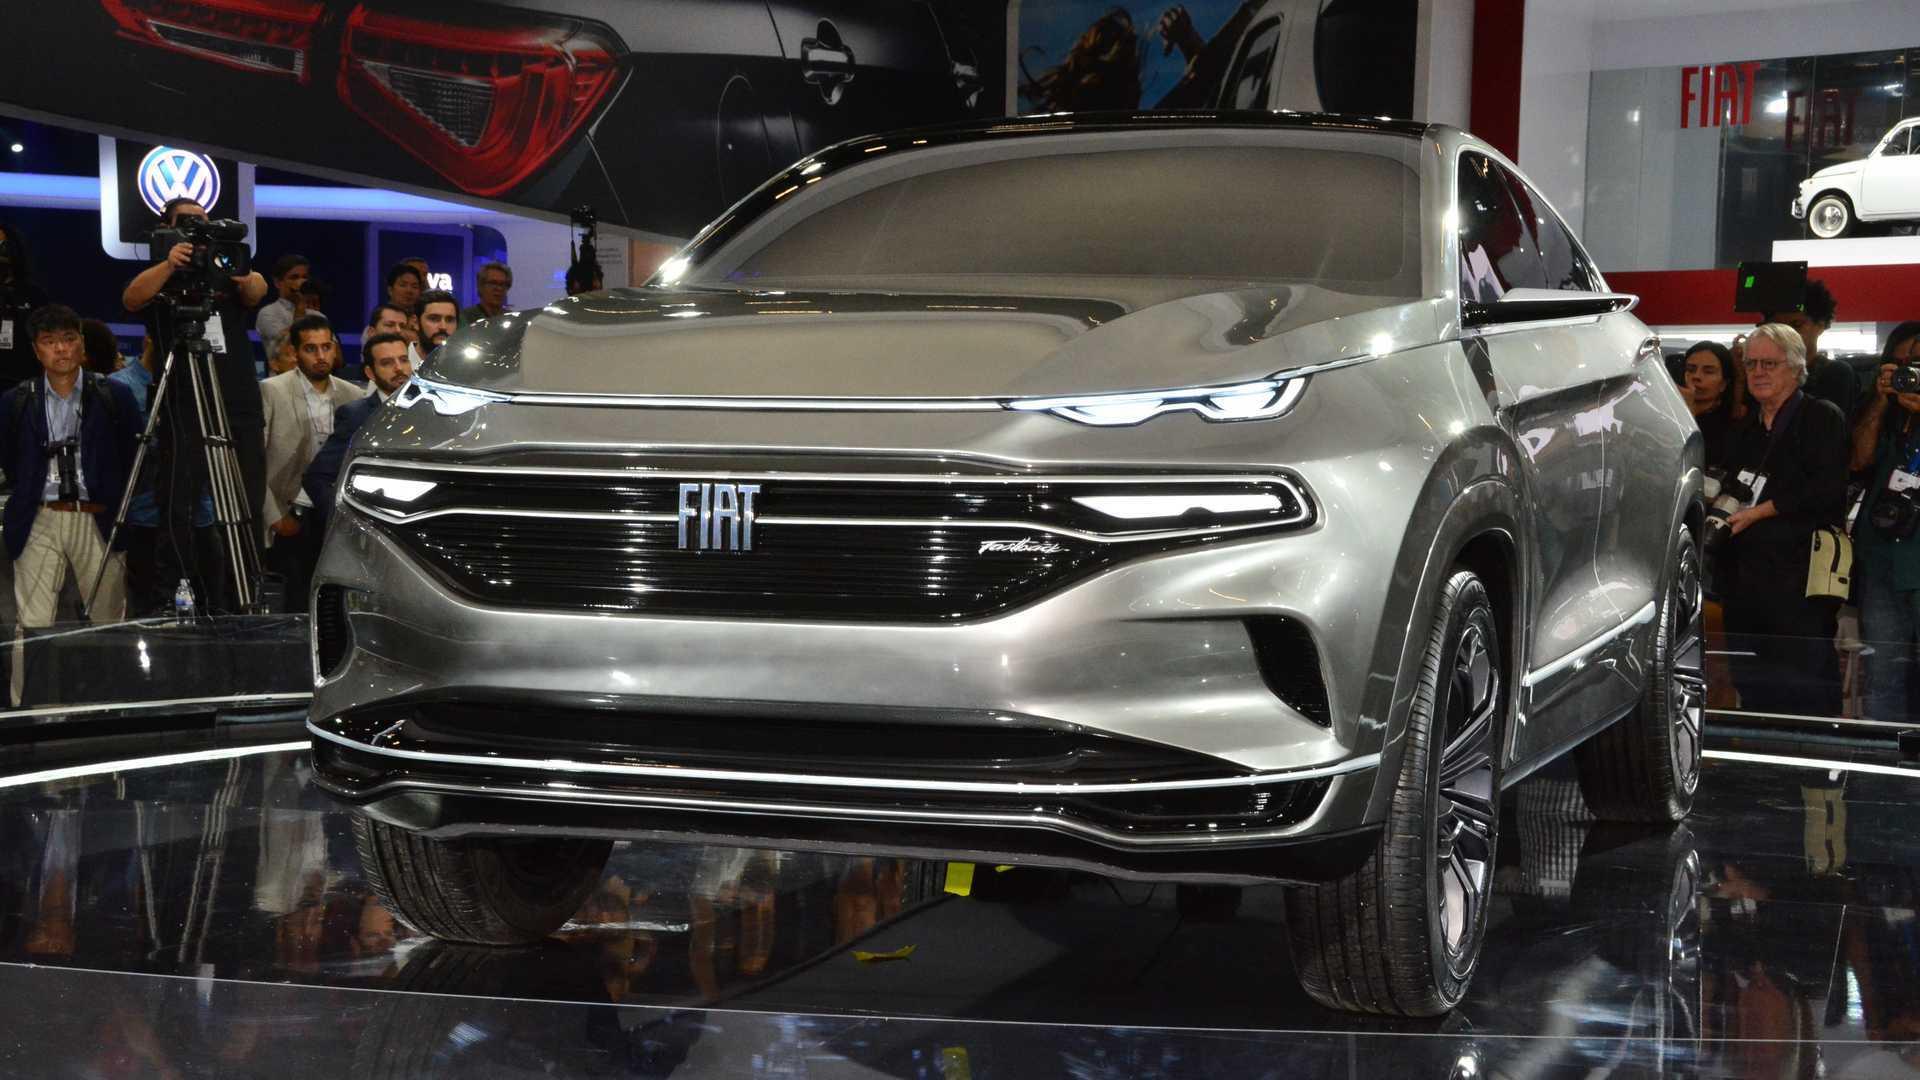 2018 - [Fiat] Fastback Concept (Sao Paulo) - Page 2 Fiat-fastback-concept-salao-de-sp-2018